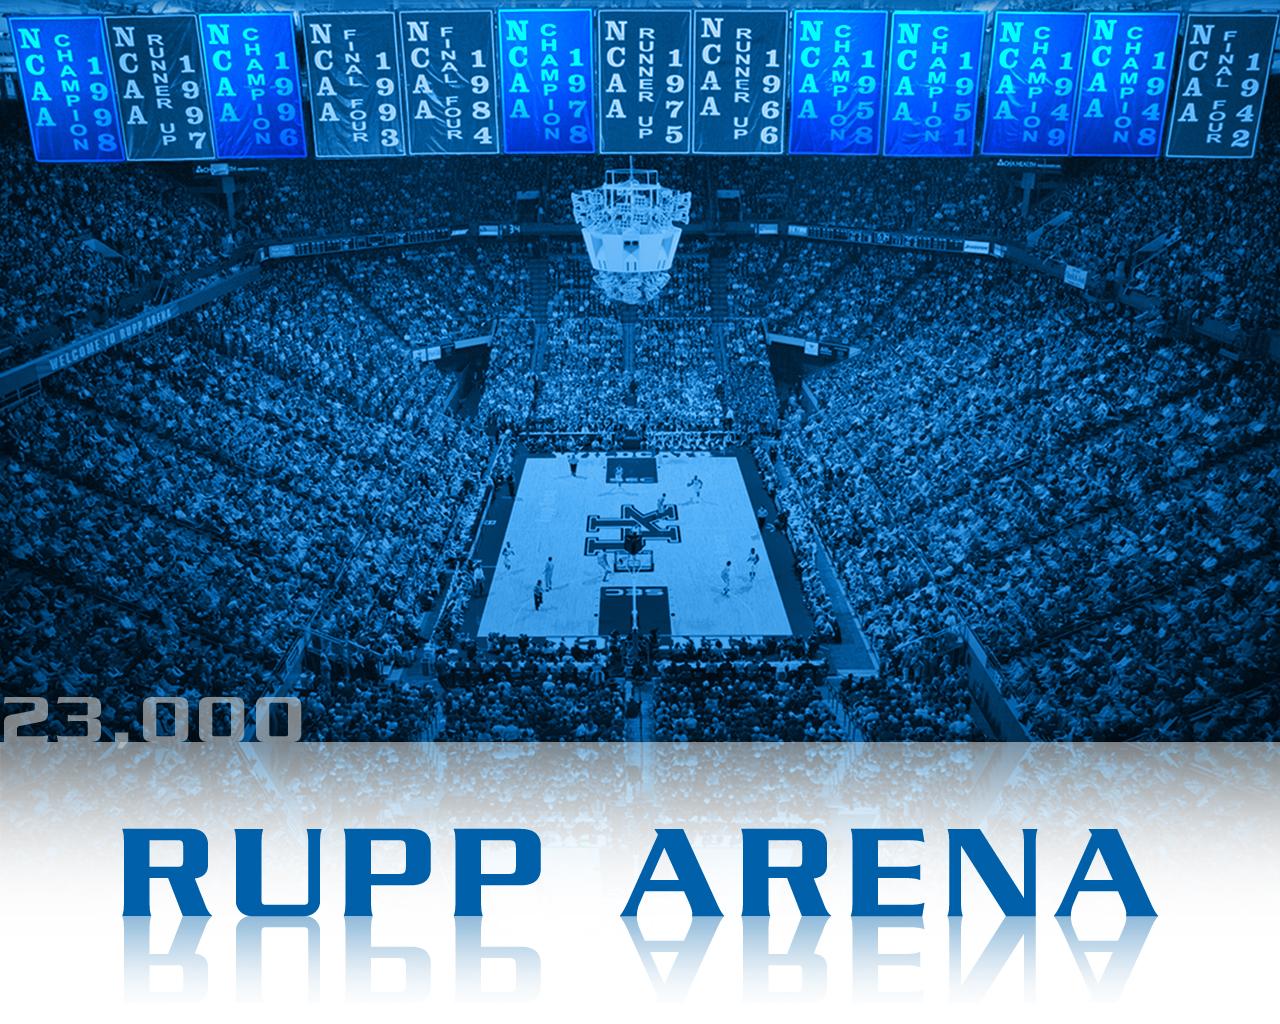 Kentucky Basketball Wallpapers: Trololo Blogg: Kentucky Wildcats Basketball Wallpaper 2012